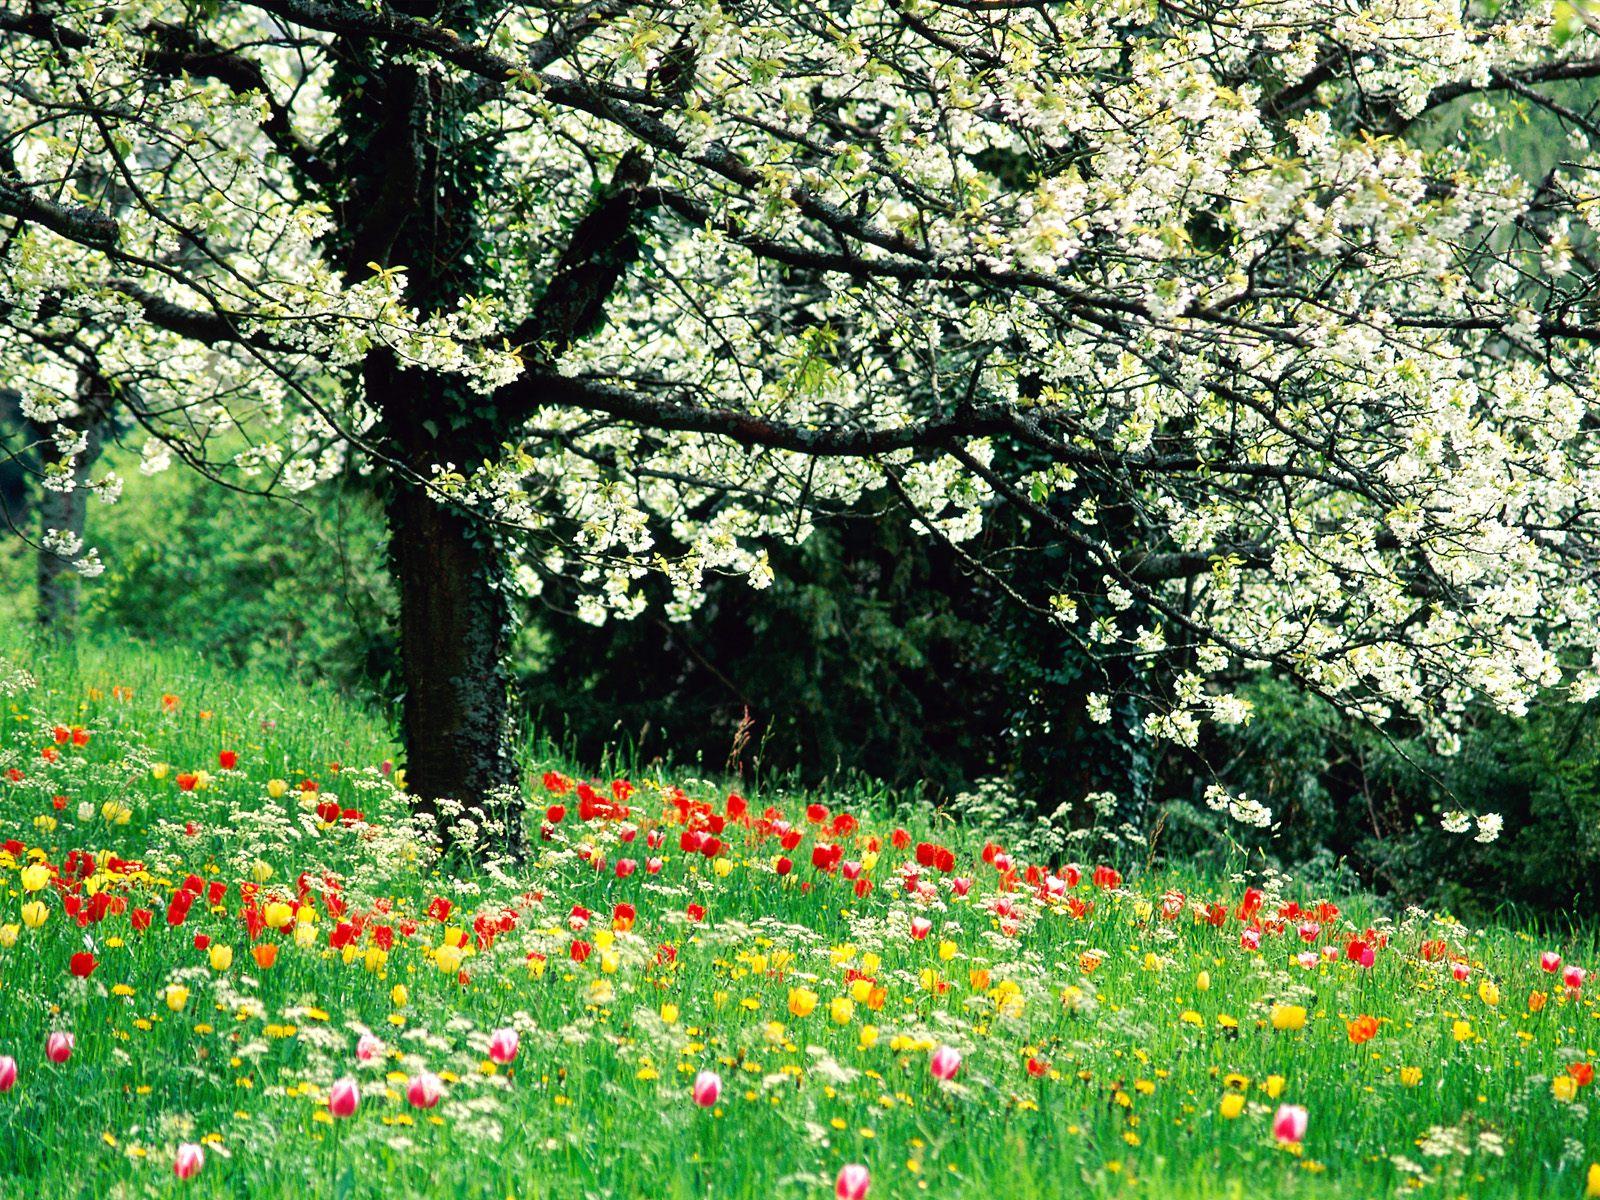 Spring Wallpapers: Cute Spring Wallpaper